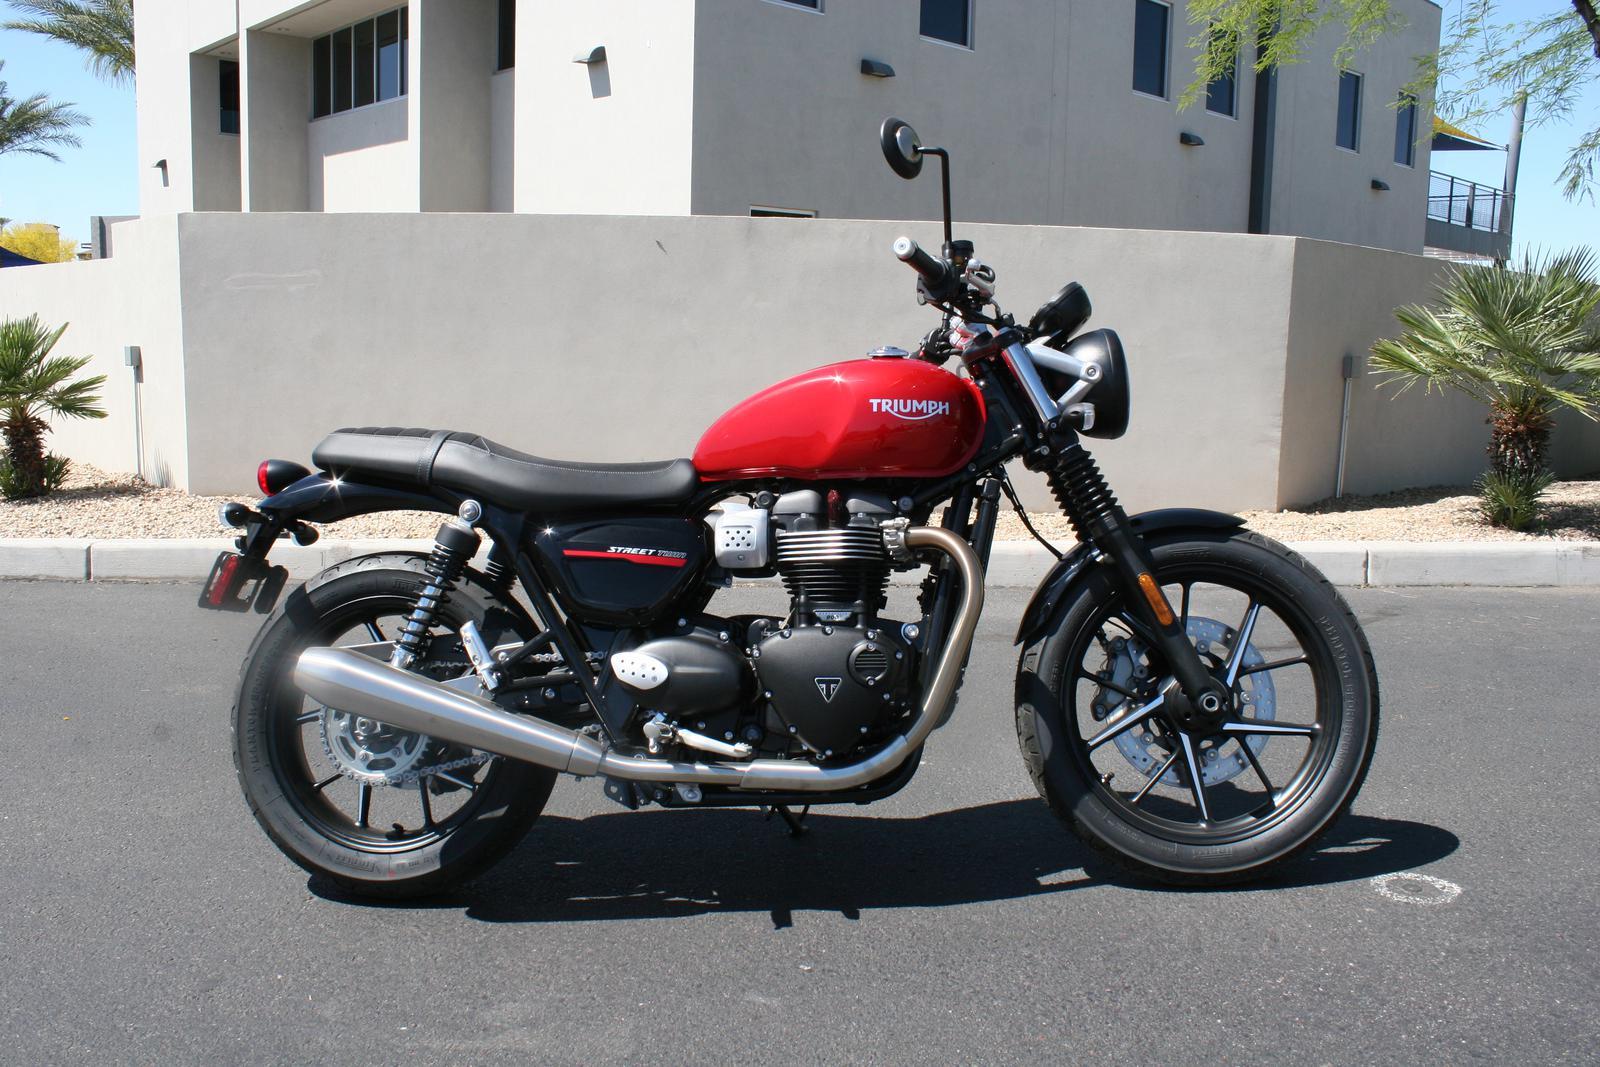 2019 Triumph Street Twin For Sale In Scottsdale Az Go Az